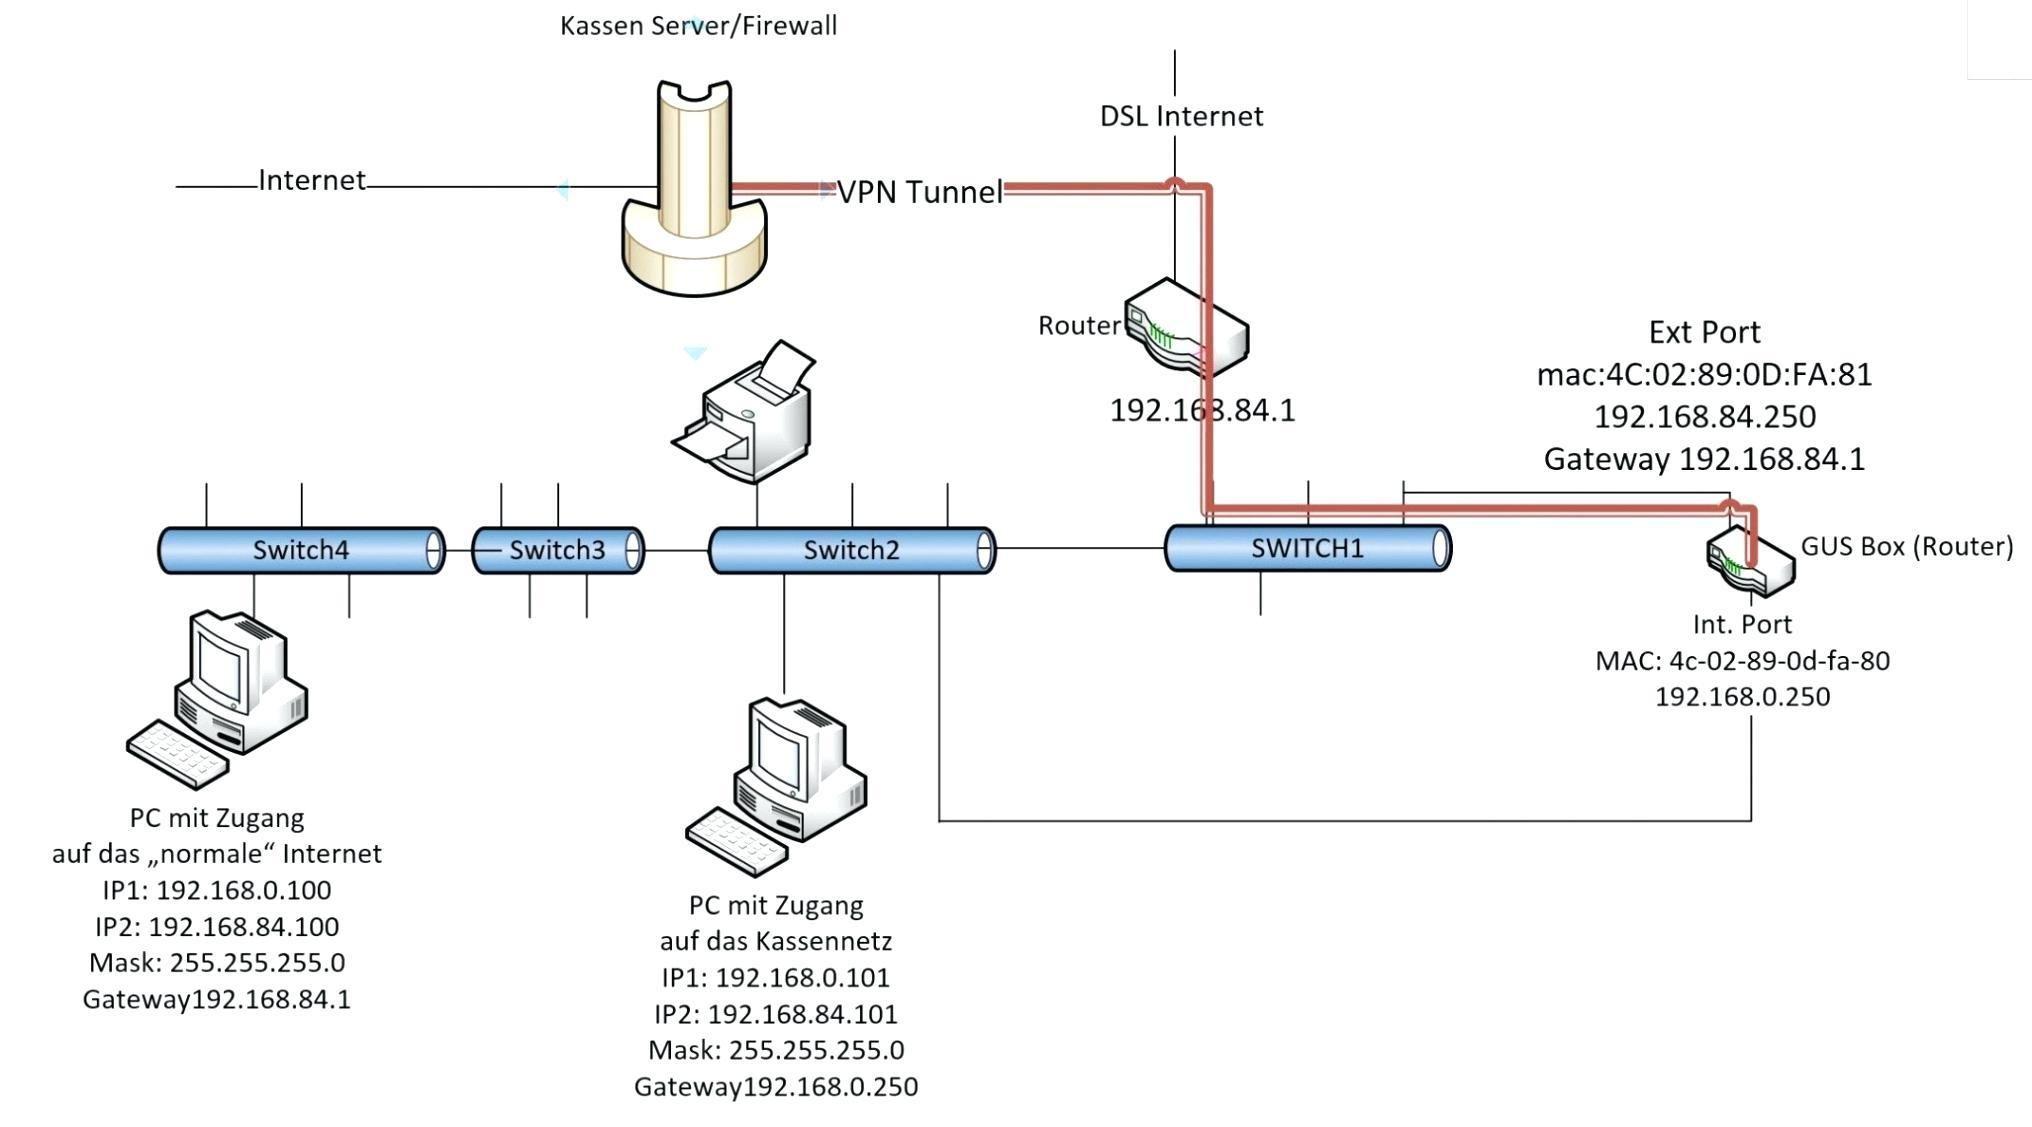 36 Clever Project Schedule Network Diagram Ideas With Images Garage Door Opener Remote Garage Door Opener Troubleshooting Garage Door Opener Installation